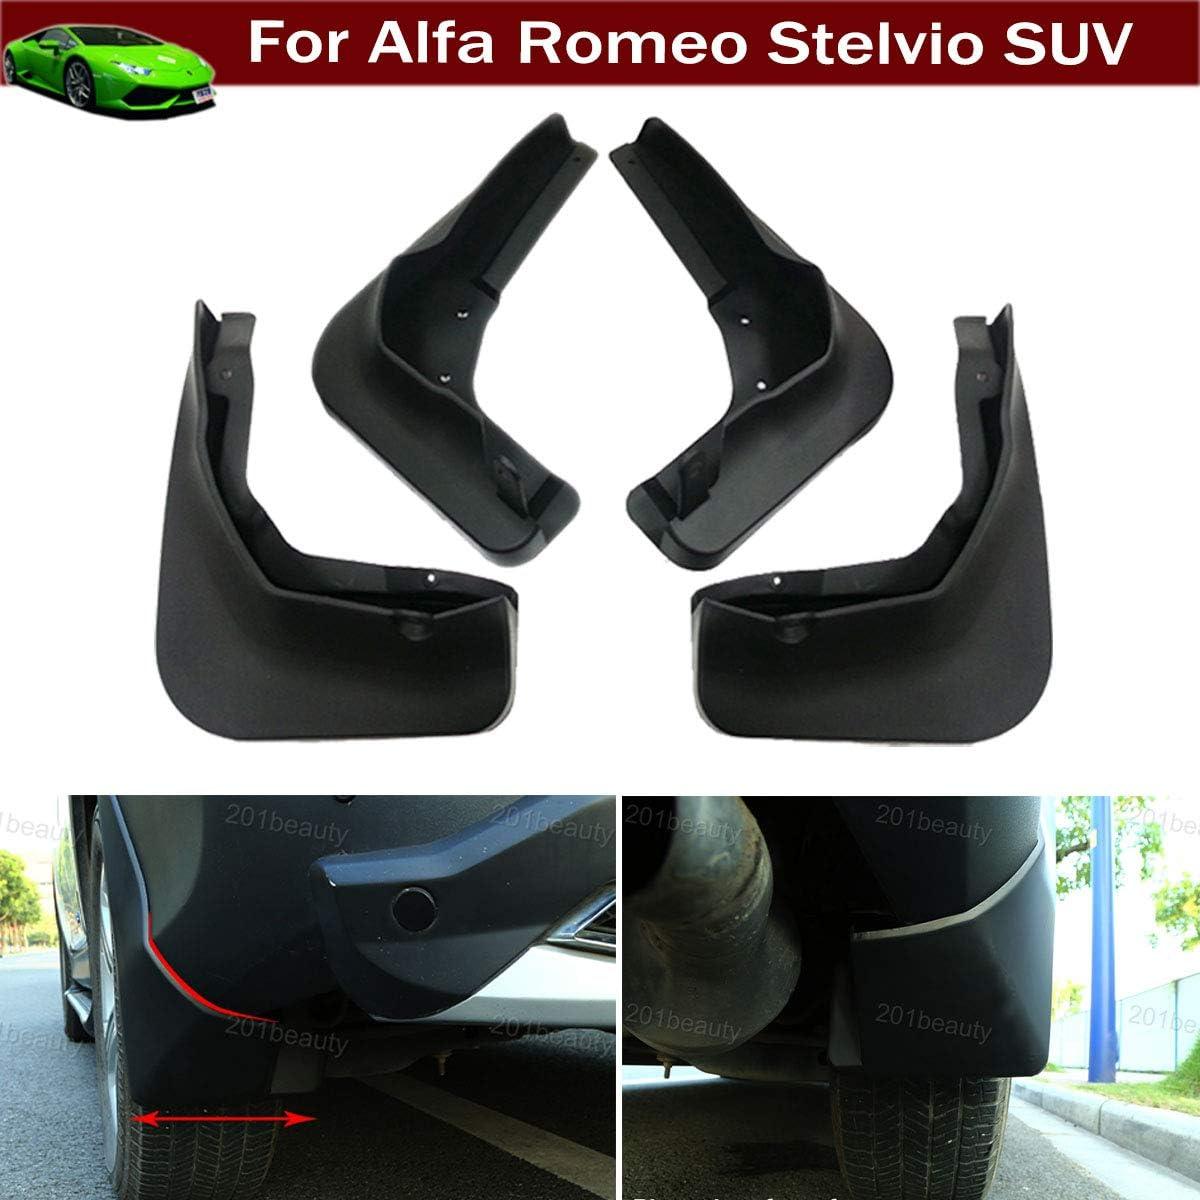 New 4pcs Black Color Front + Rear Car Mud Flaps Mudflaps Mud Guards Mudguard Splash Guard Fender Custom Fit for Alfa Romeo Stelvio SUV 2018 2019 2020